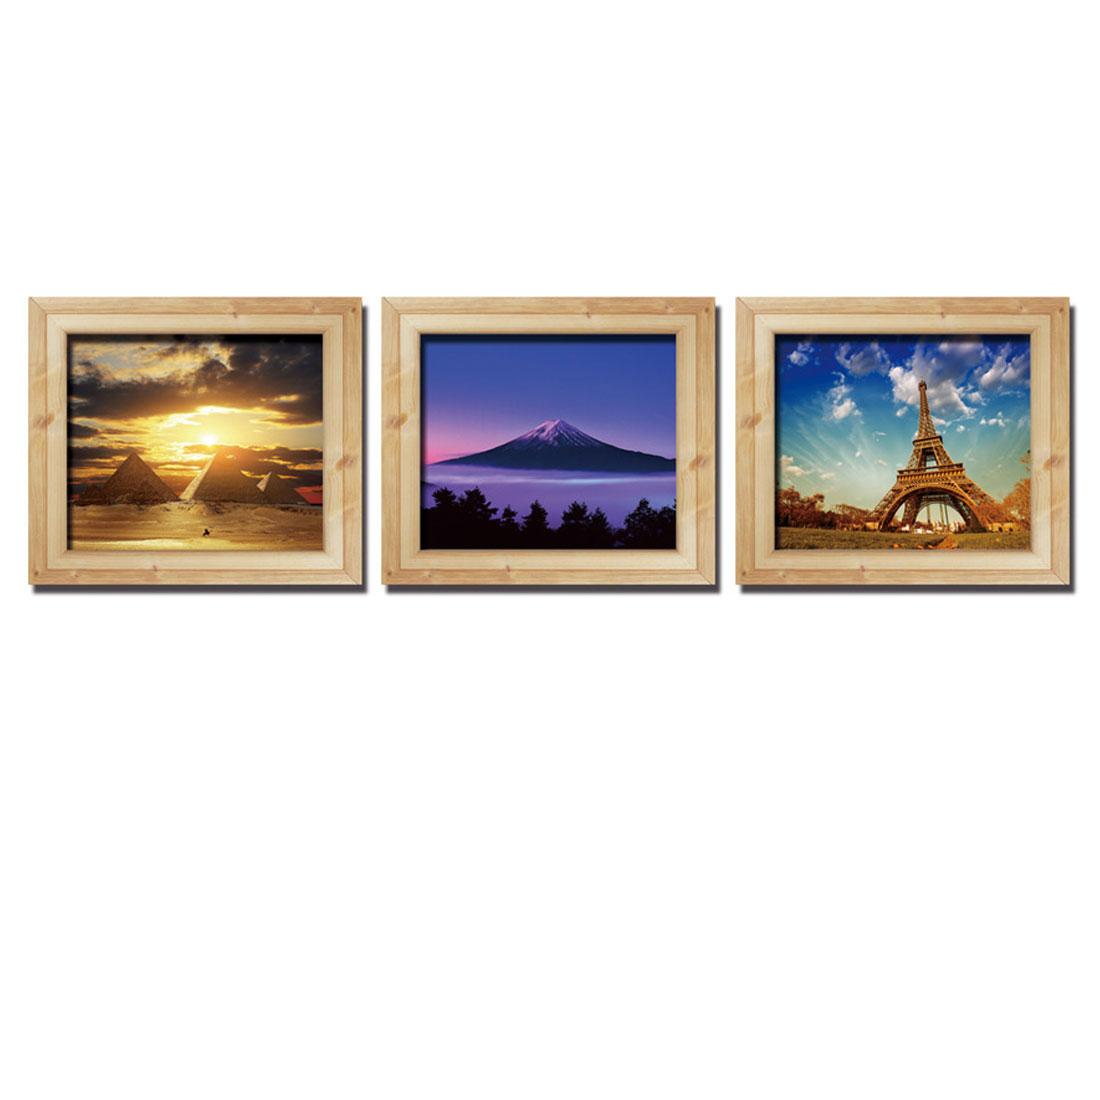 Home Room PVC Desert Landscape Pattern Removable 3D Magic DIY Wall Decoration Art Sticker Decal